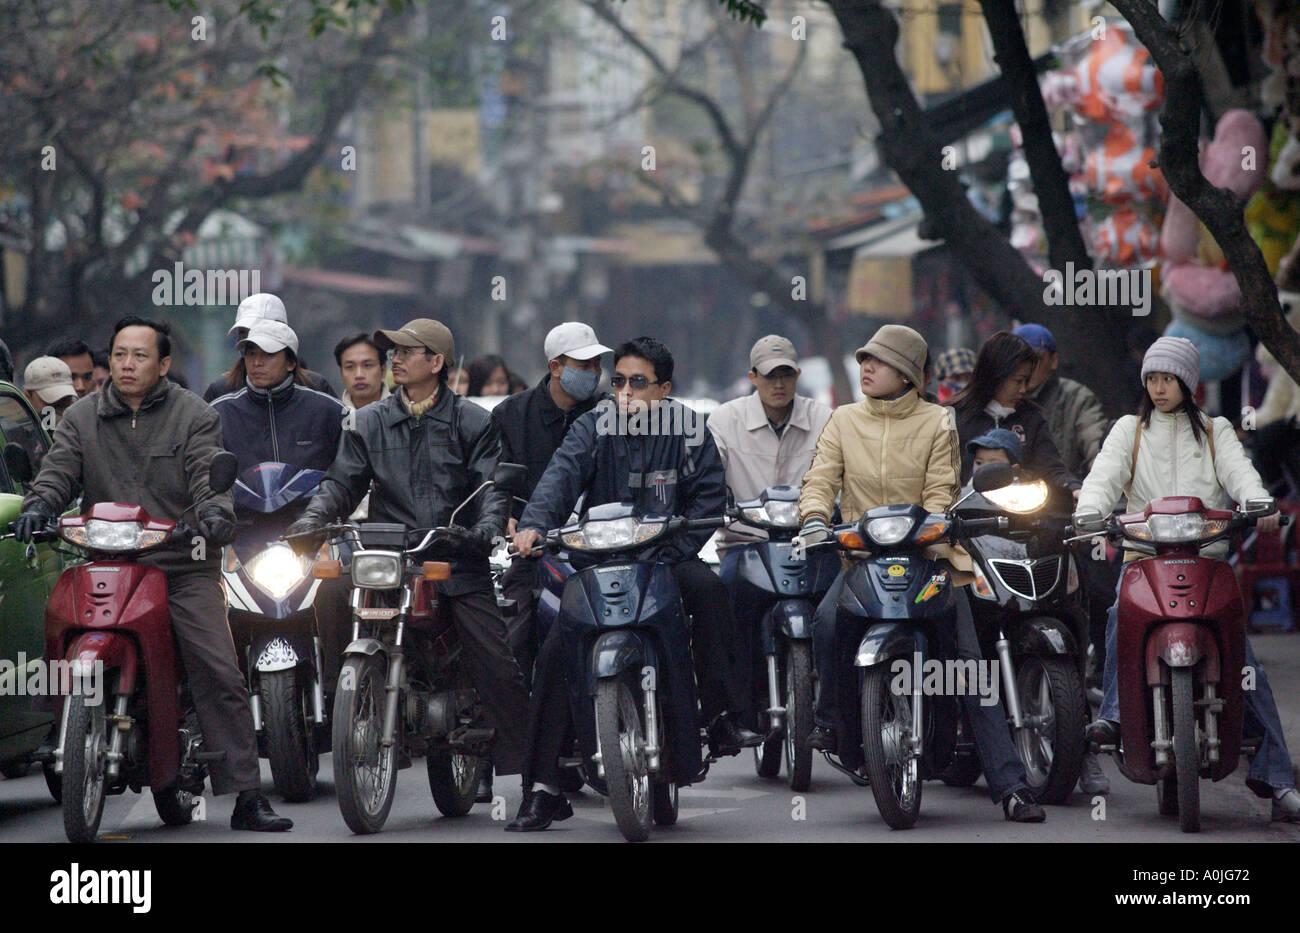 The morning rush hour in Hanoi capital of Vietnam - Stock Image